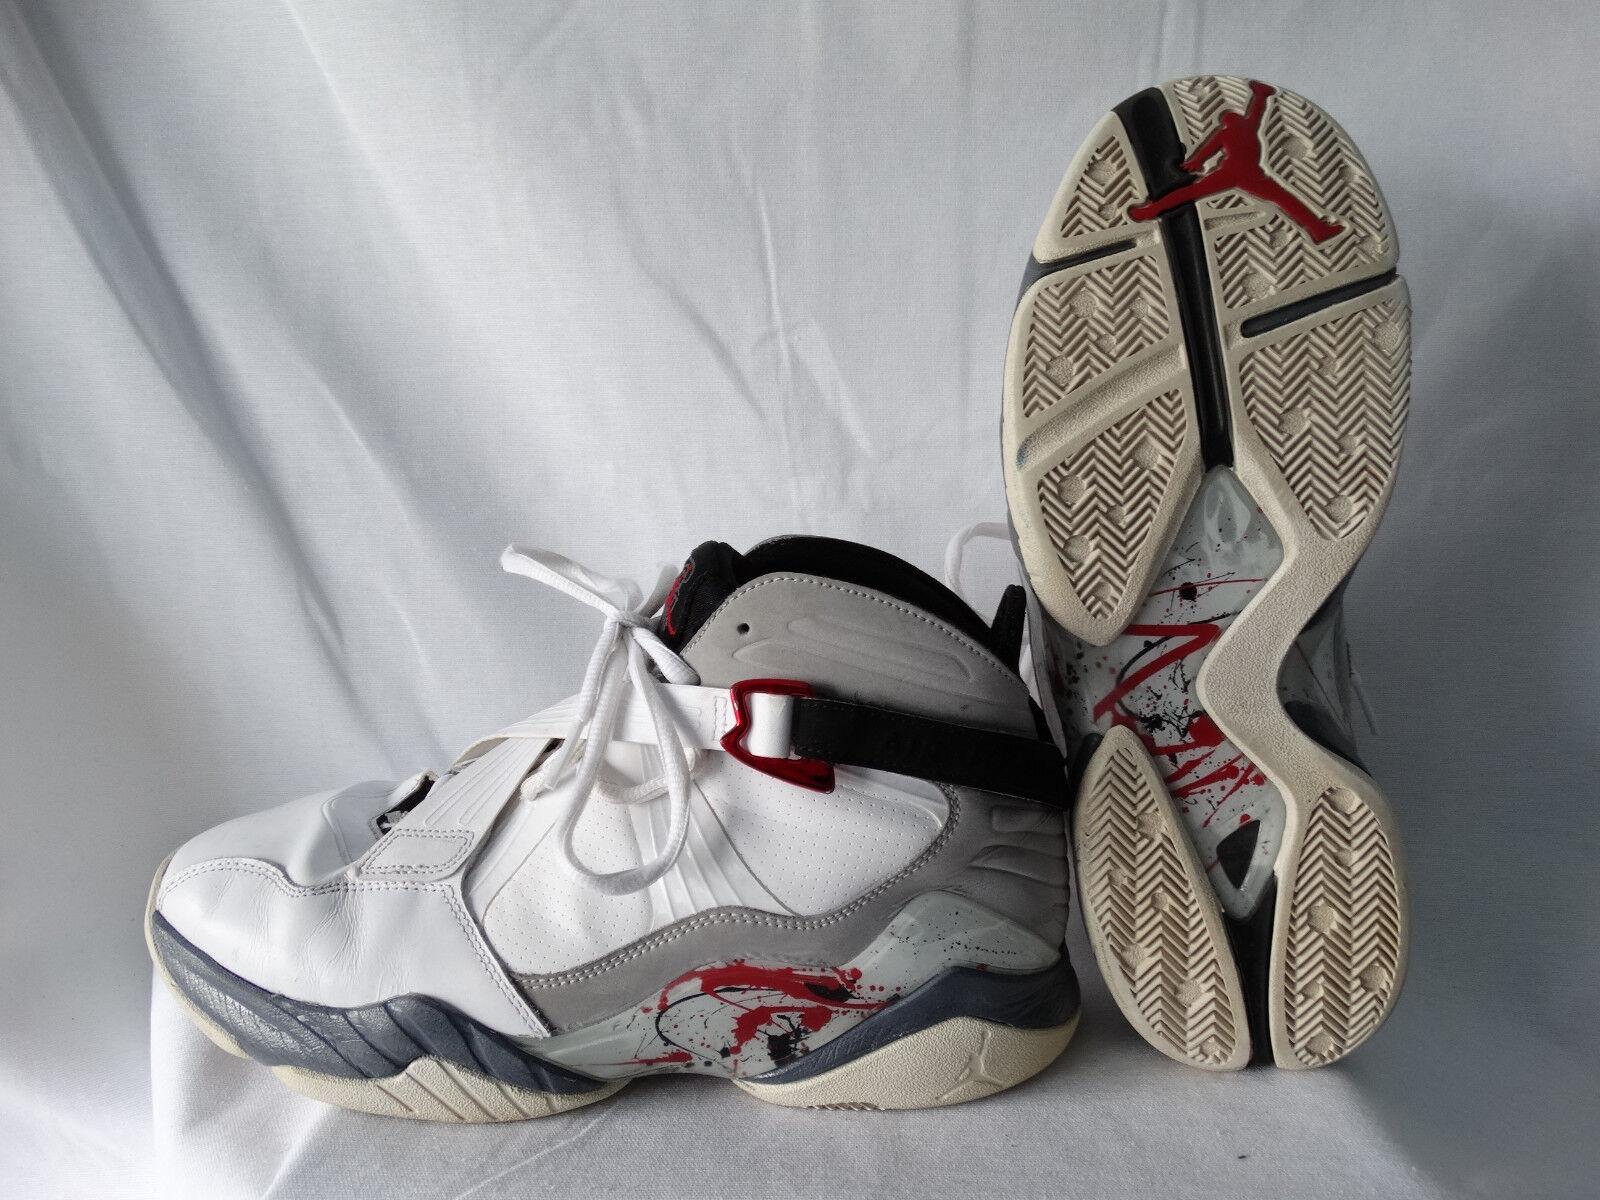 Nike Air Jordan 8 (VIII) Retro Basketballschuhe weiß-grau EU 45 US 11